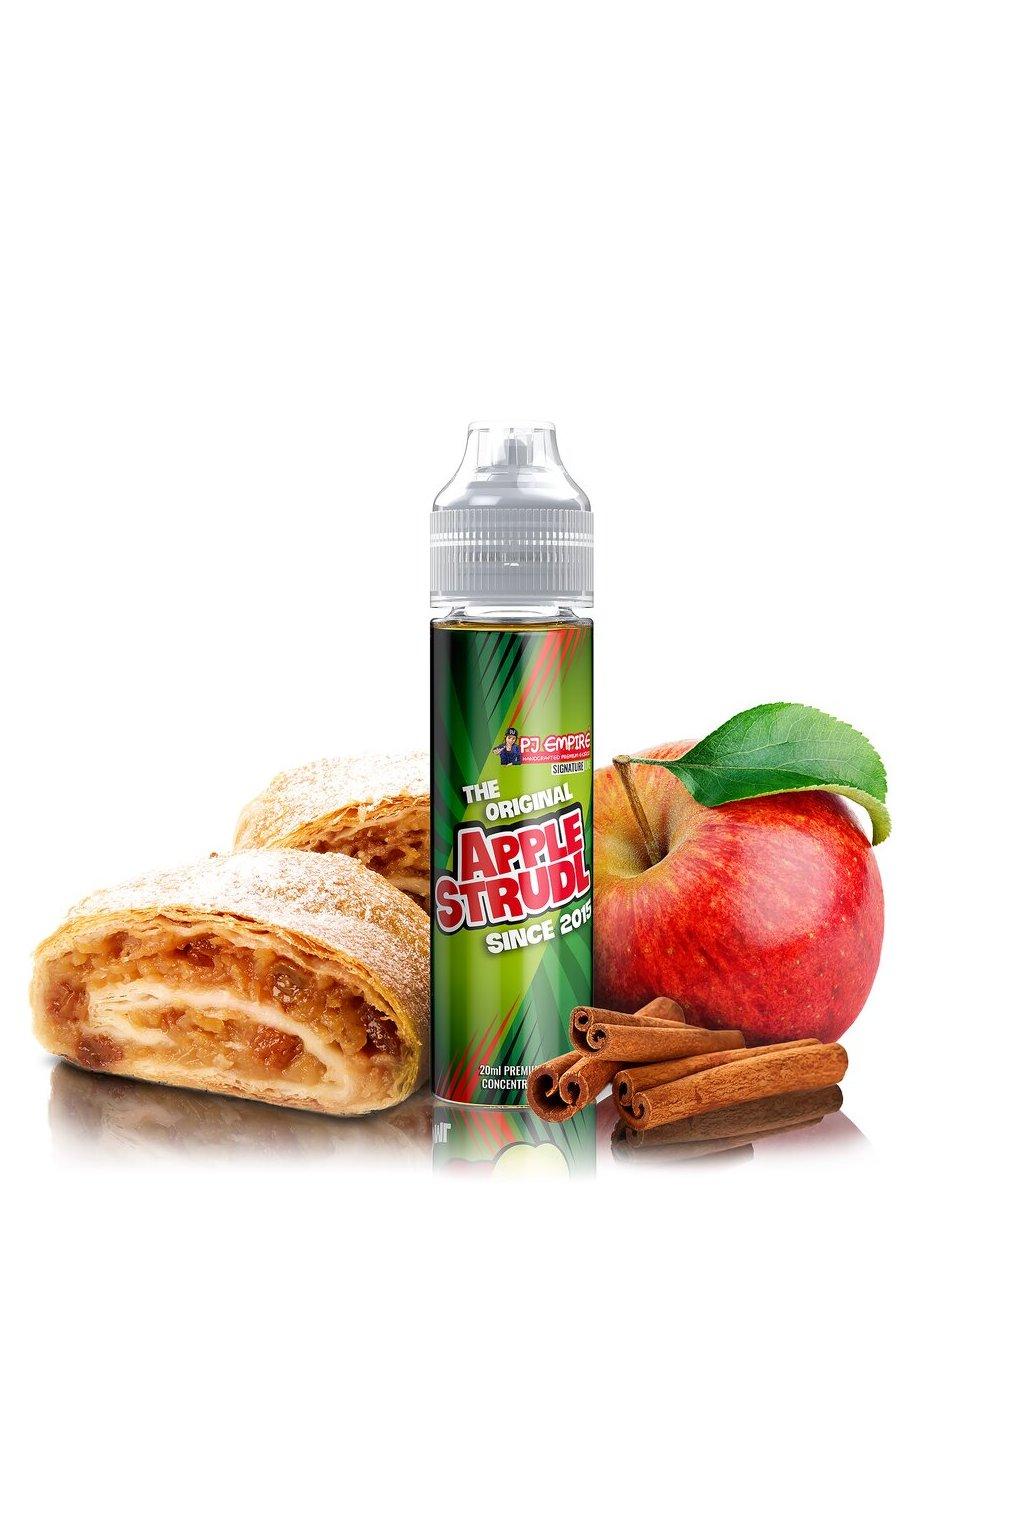 apple strudl pj empire liquid